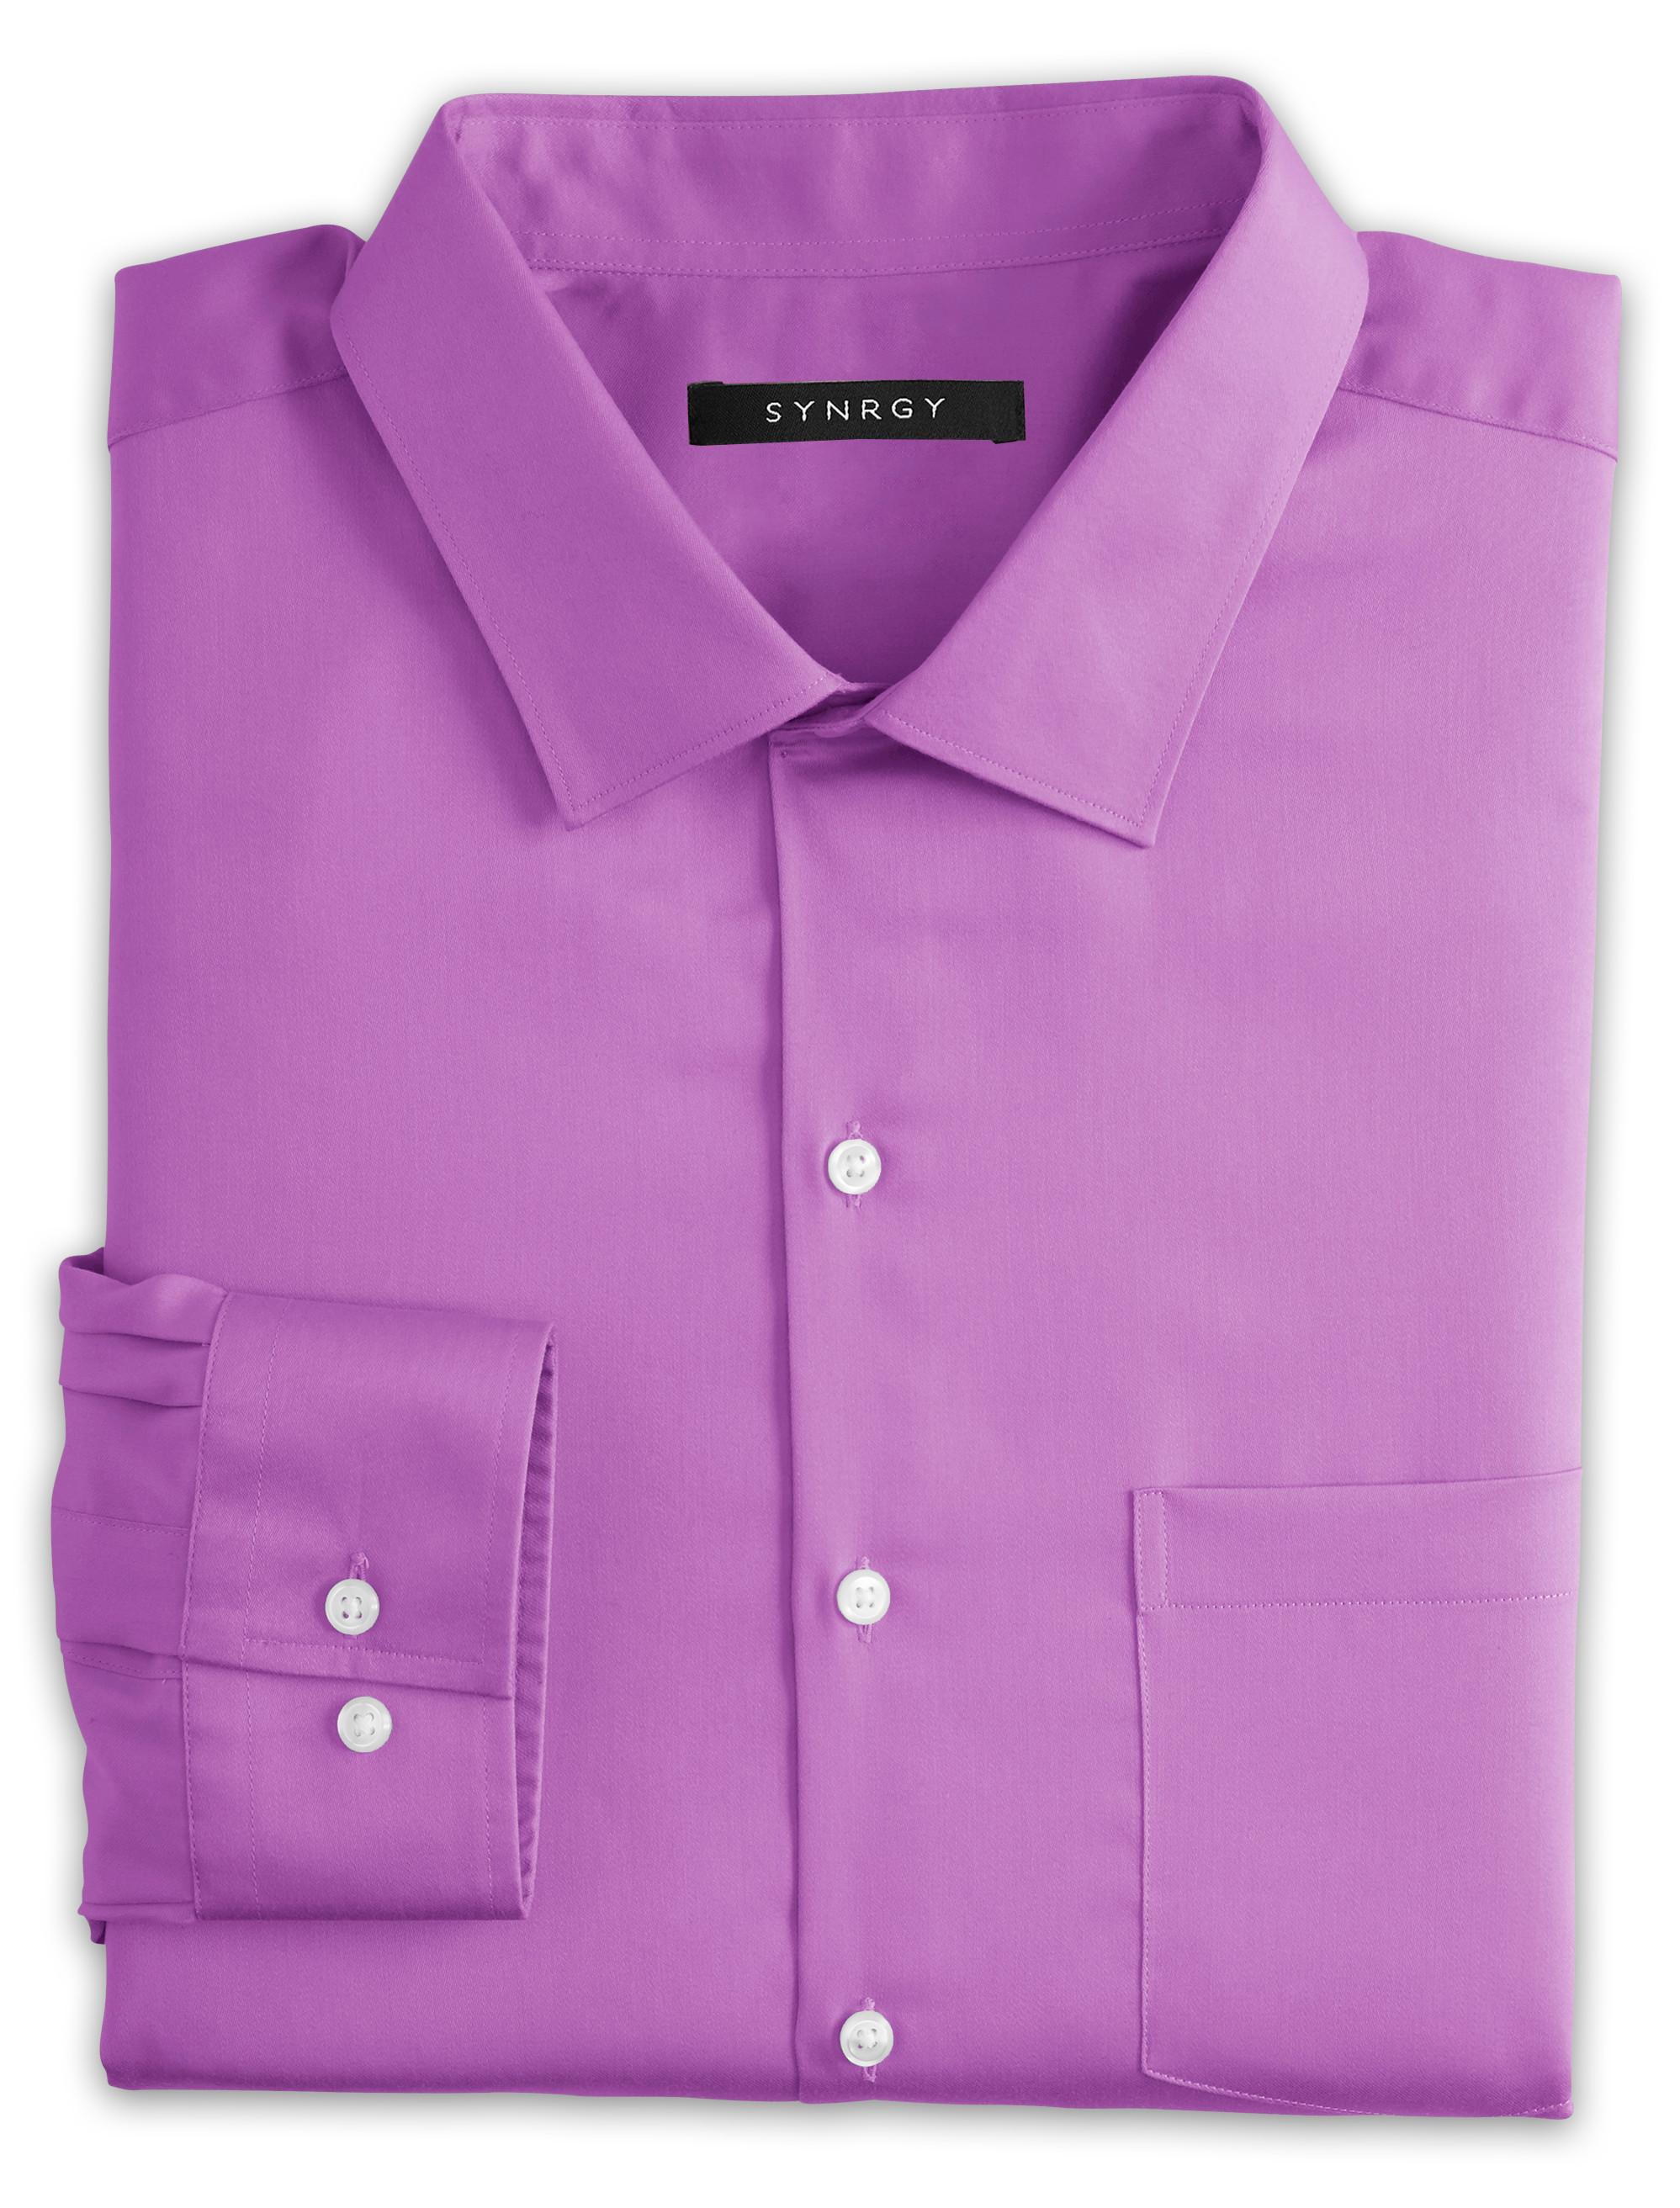 Synrgy Sateen Dress Shirt